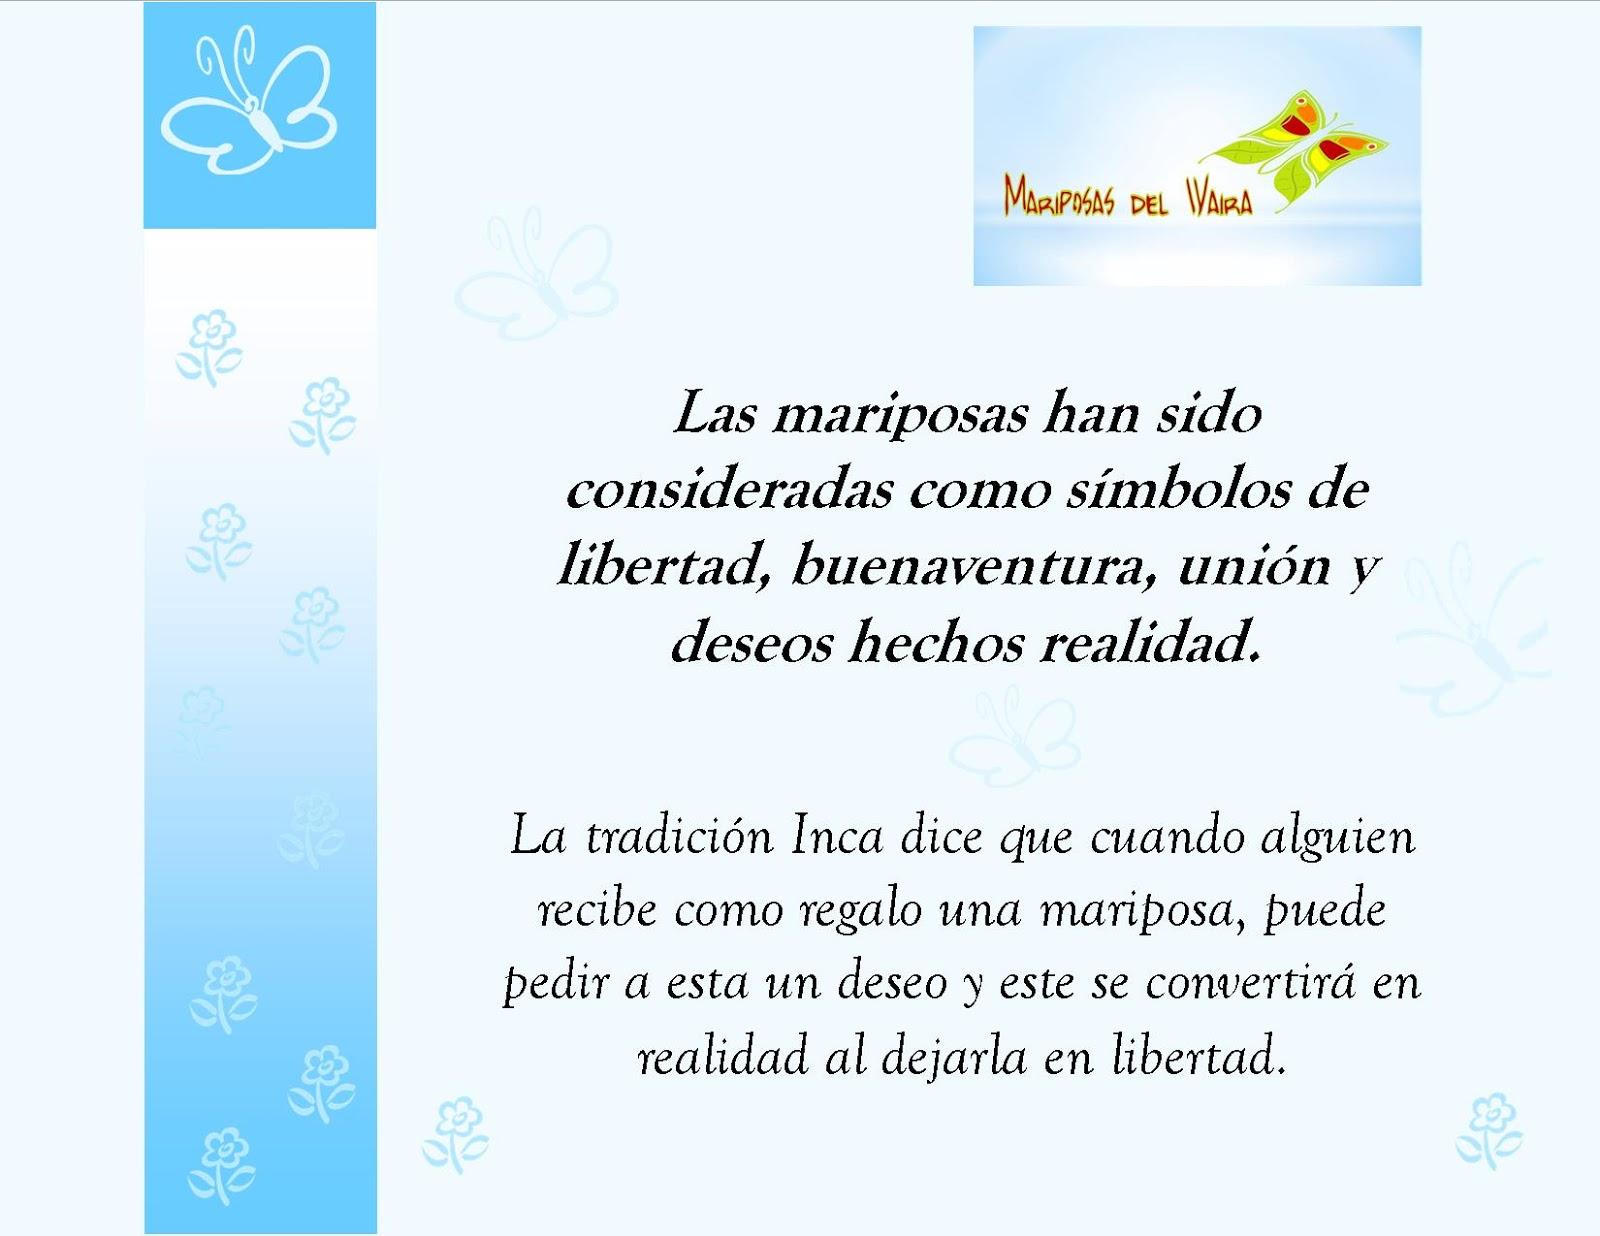 Mariposas Del Waira